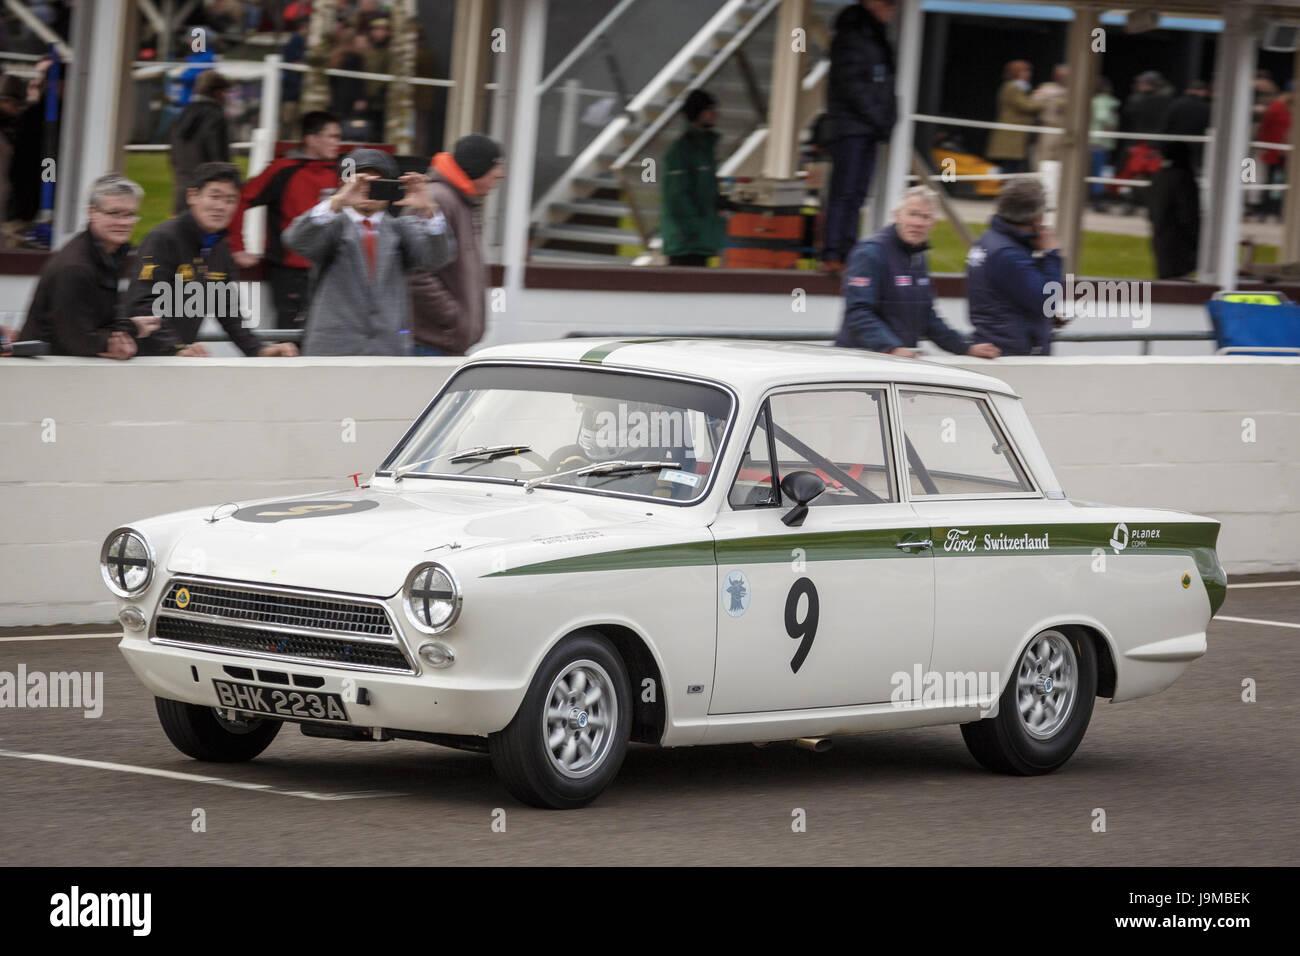 Ford Cortina Mk1 Stock Photos & Ford Cortina Mk1 Stock Images - Alamy